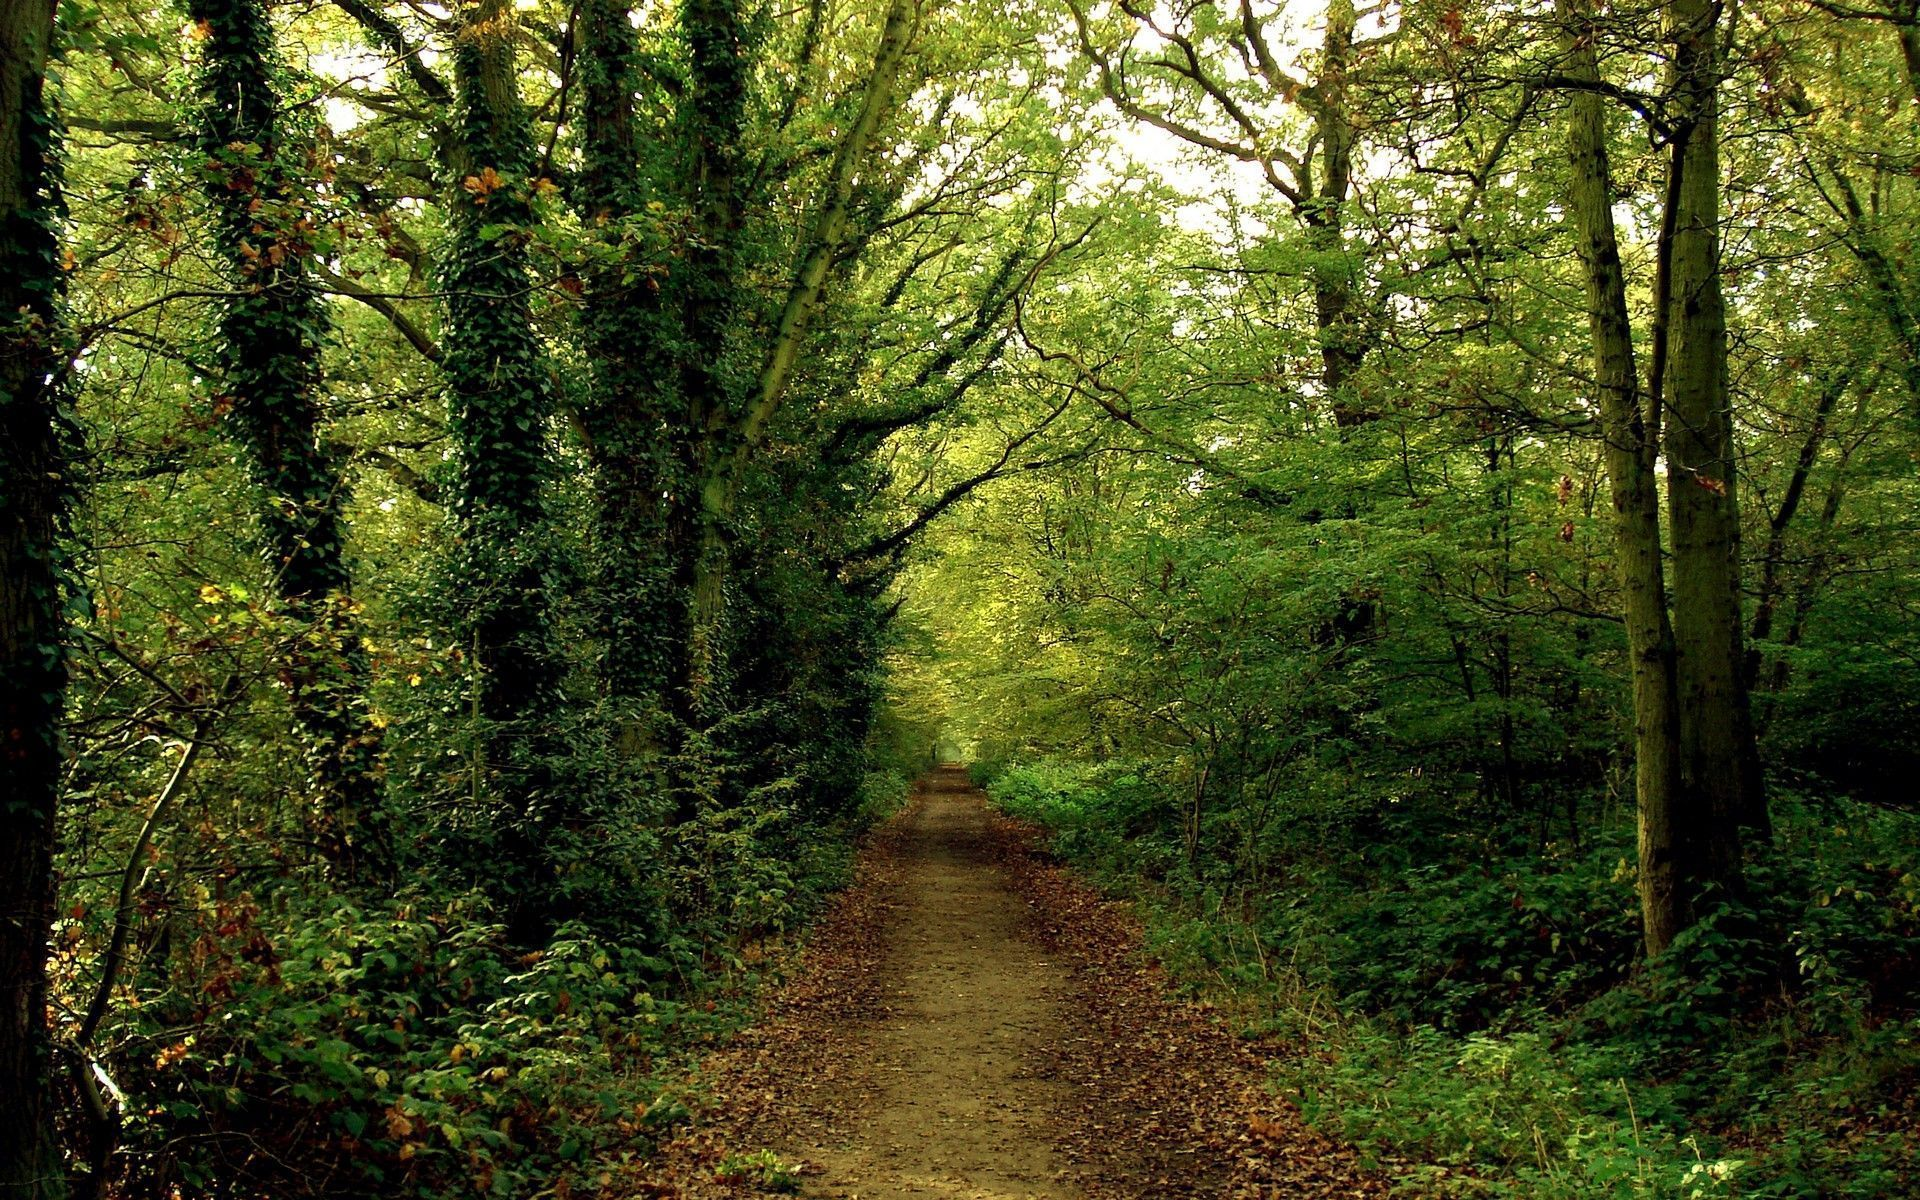 Woods Background